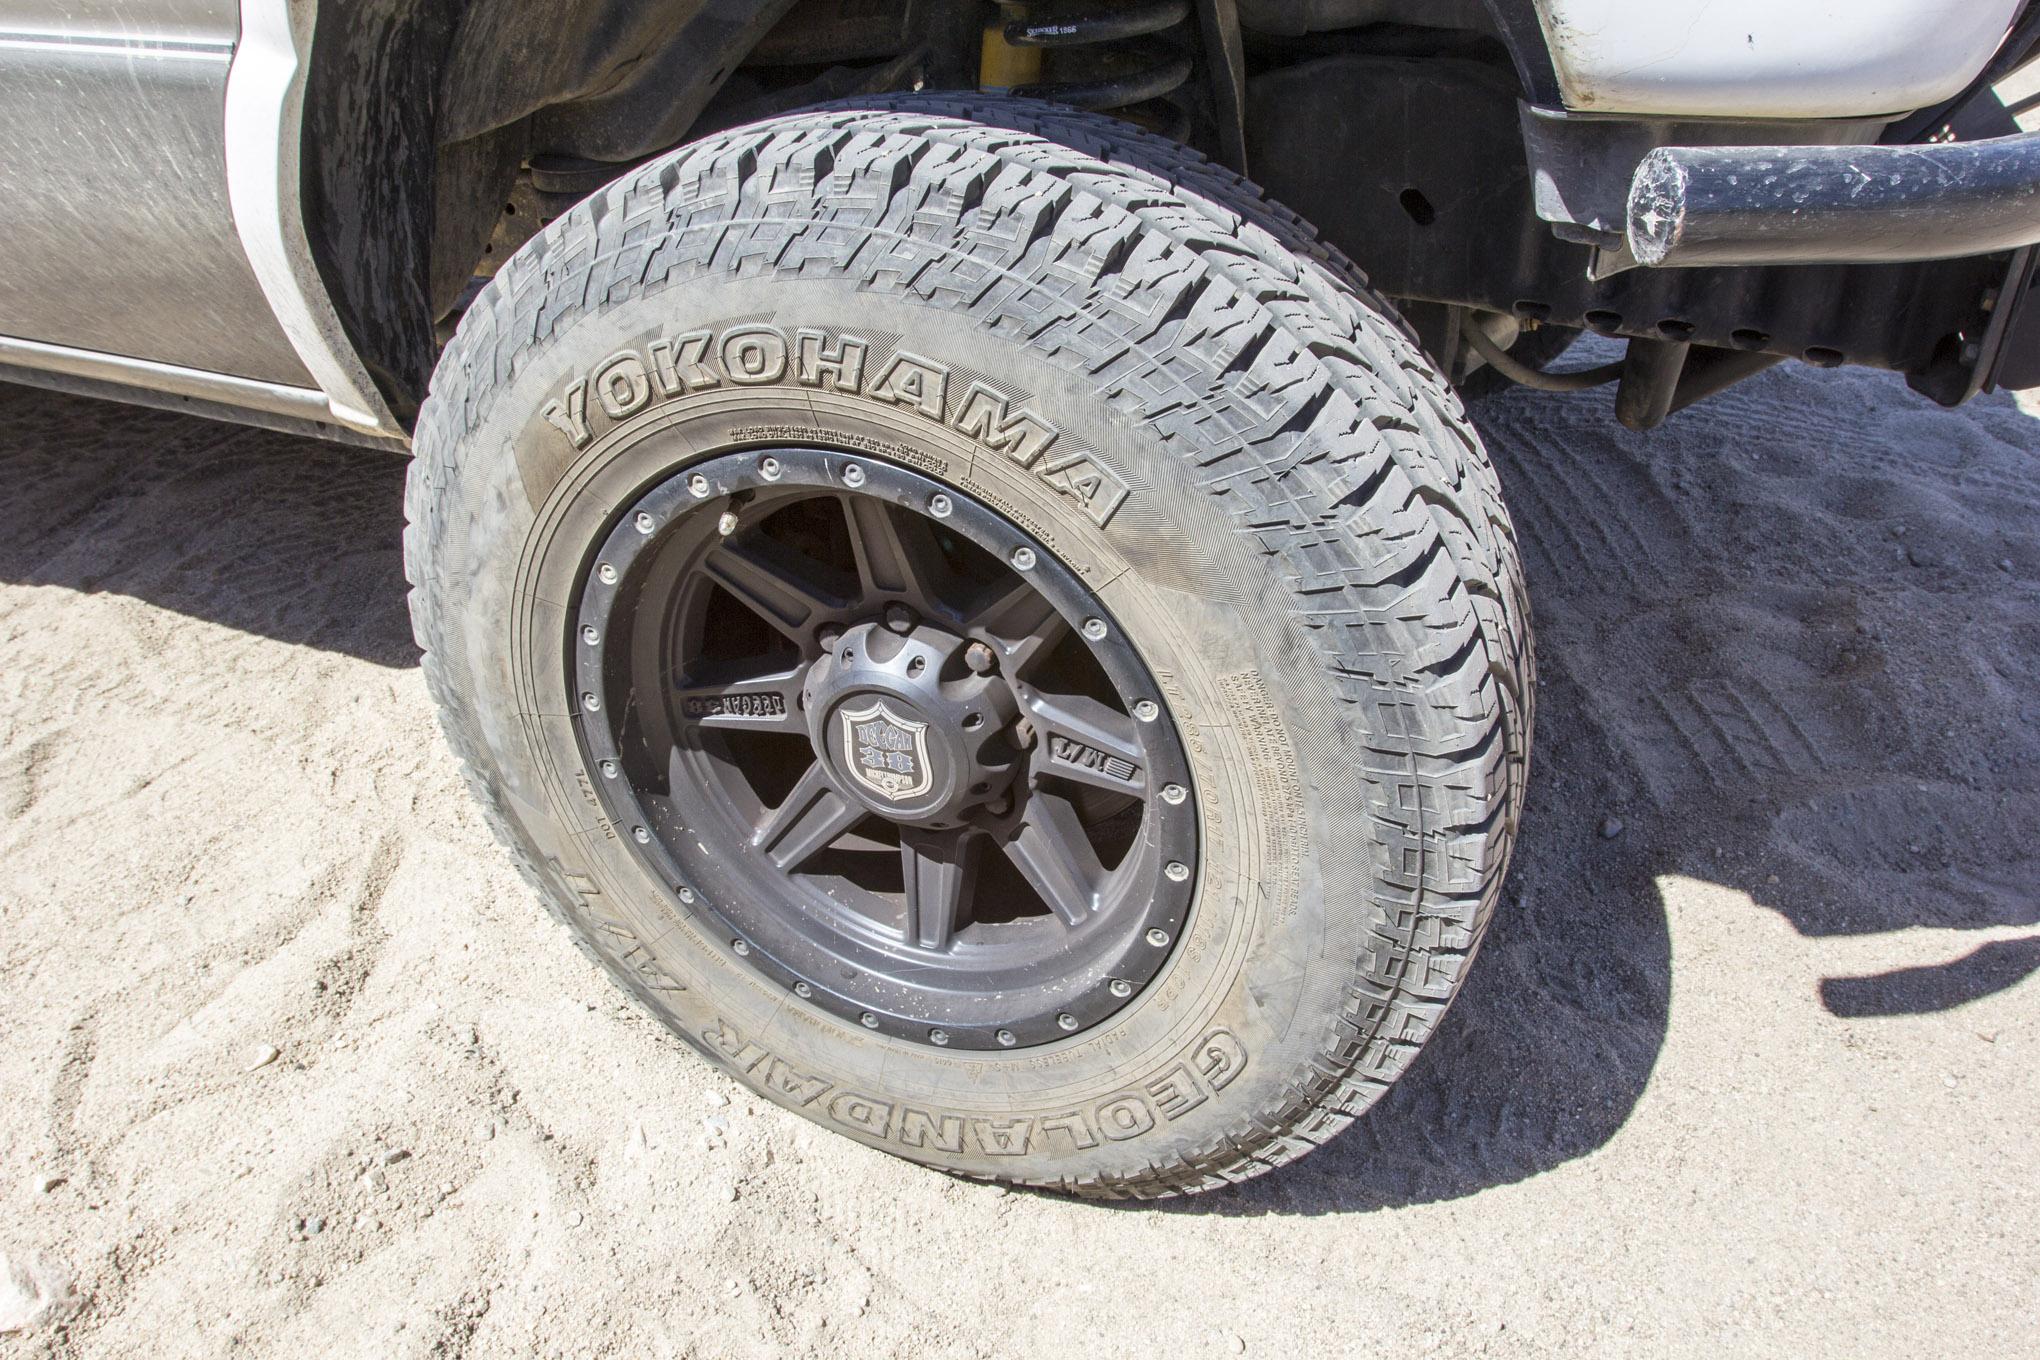 Testing Yokohama's Newest All-Terrain Tire, the G015